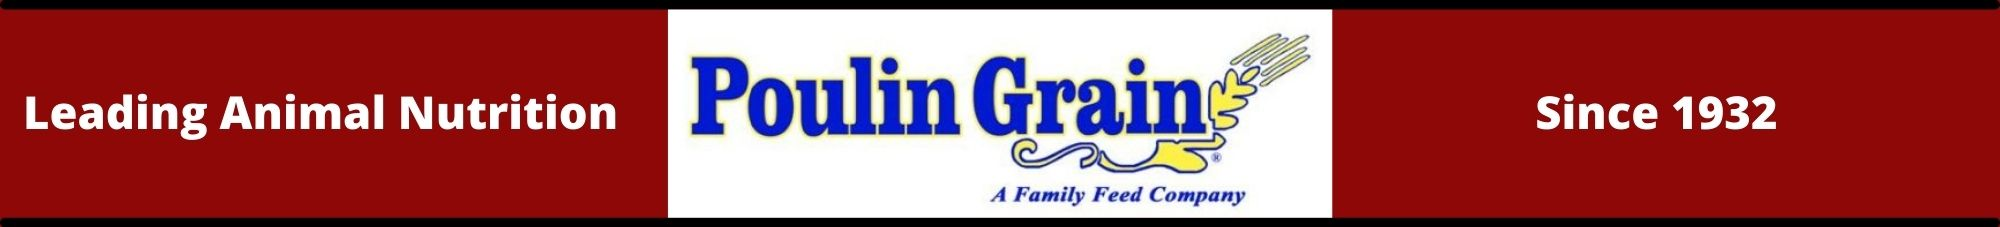 Poulin Grain banner